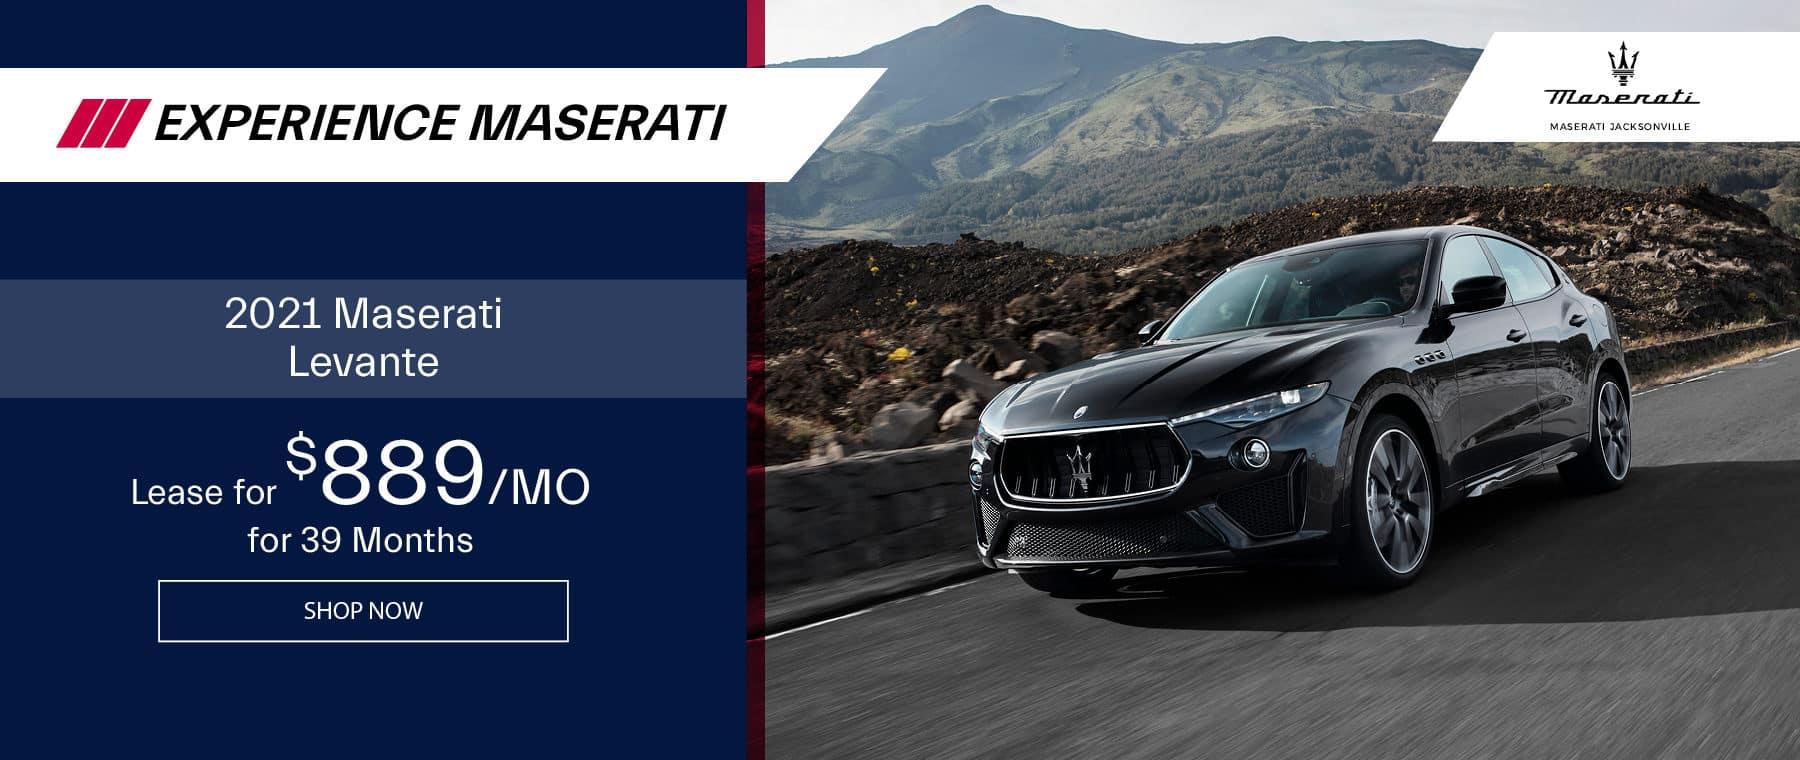 MaseratiJax_Experiencemaserati_WB_August21 246672